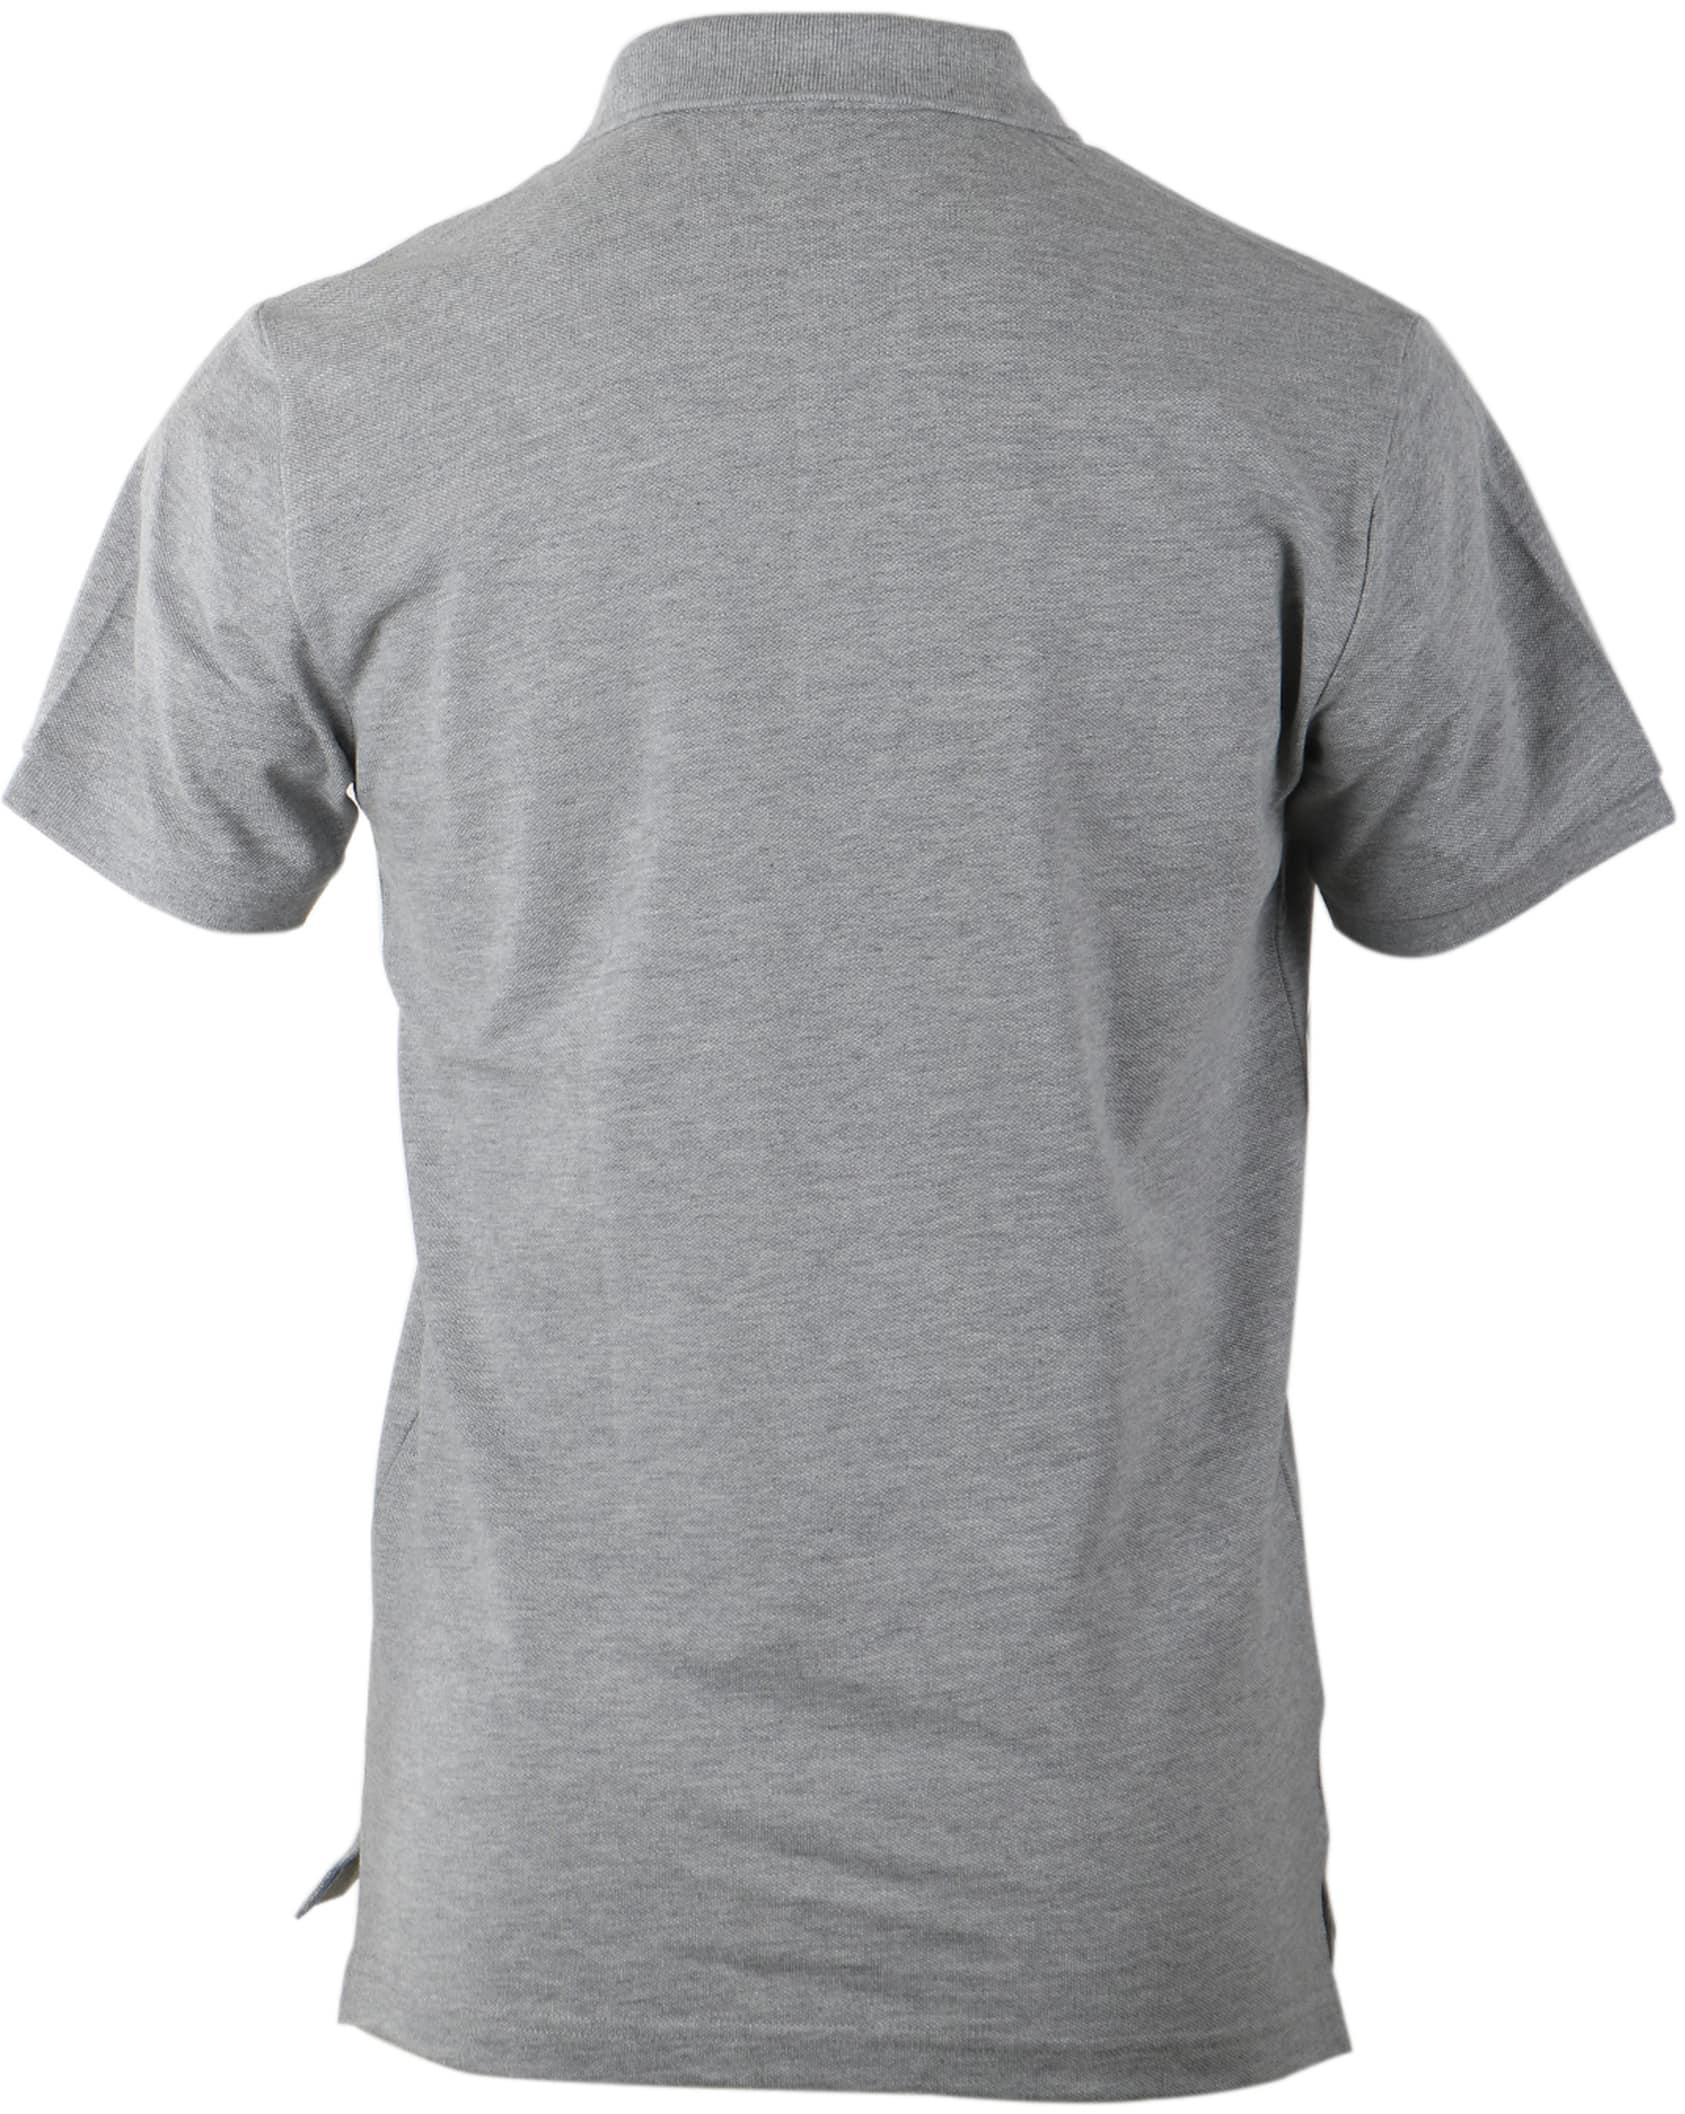 Profuomo Poloshirt Grijs foto 1